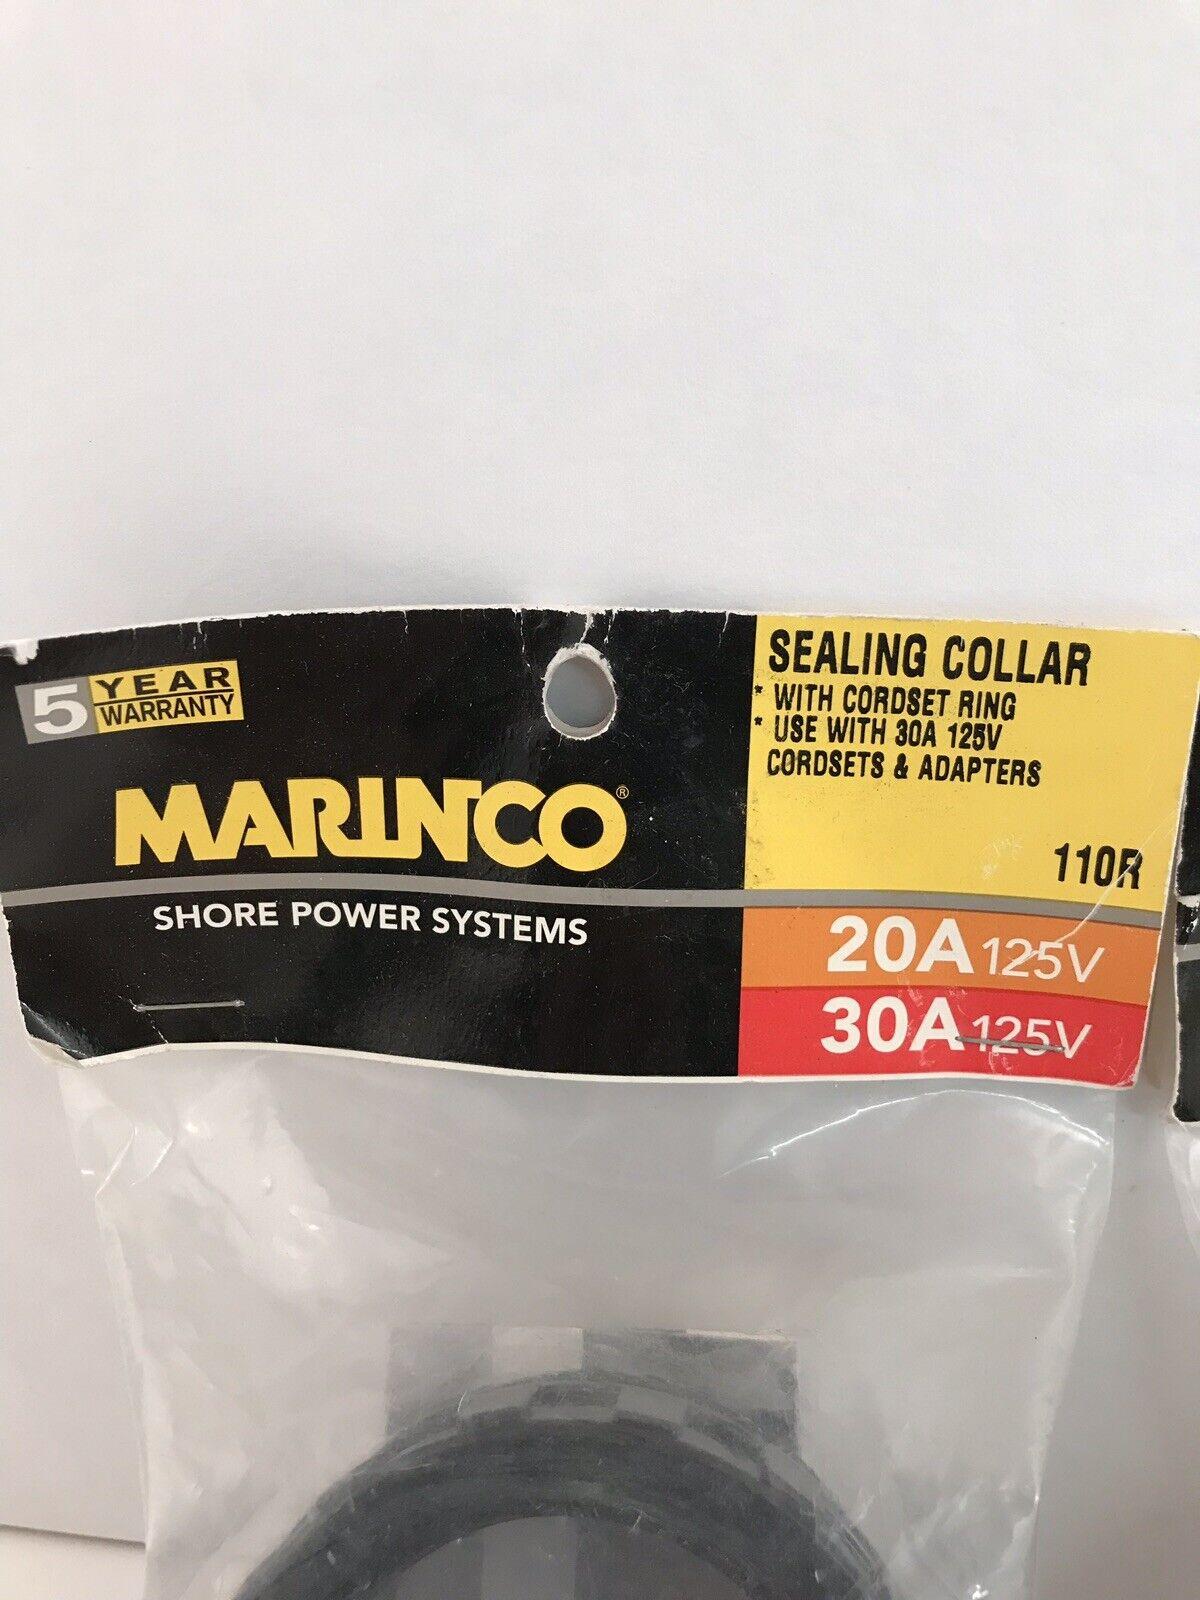 Marinco 110R Shore Power Sealing Collar W// Threaded Ring